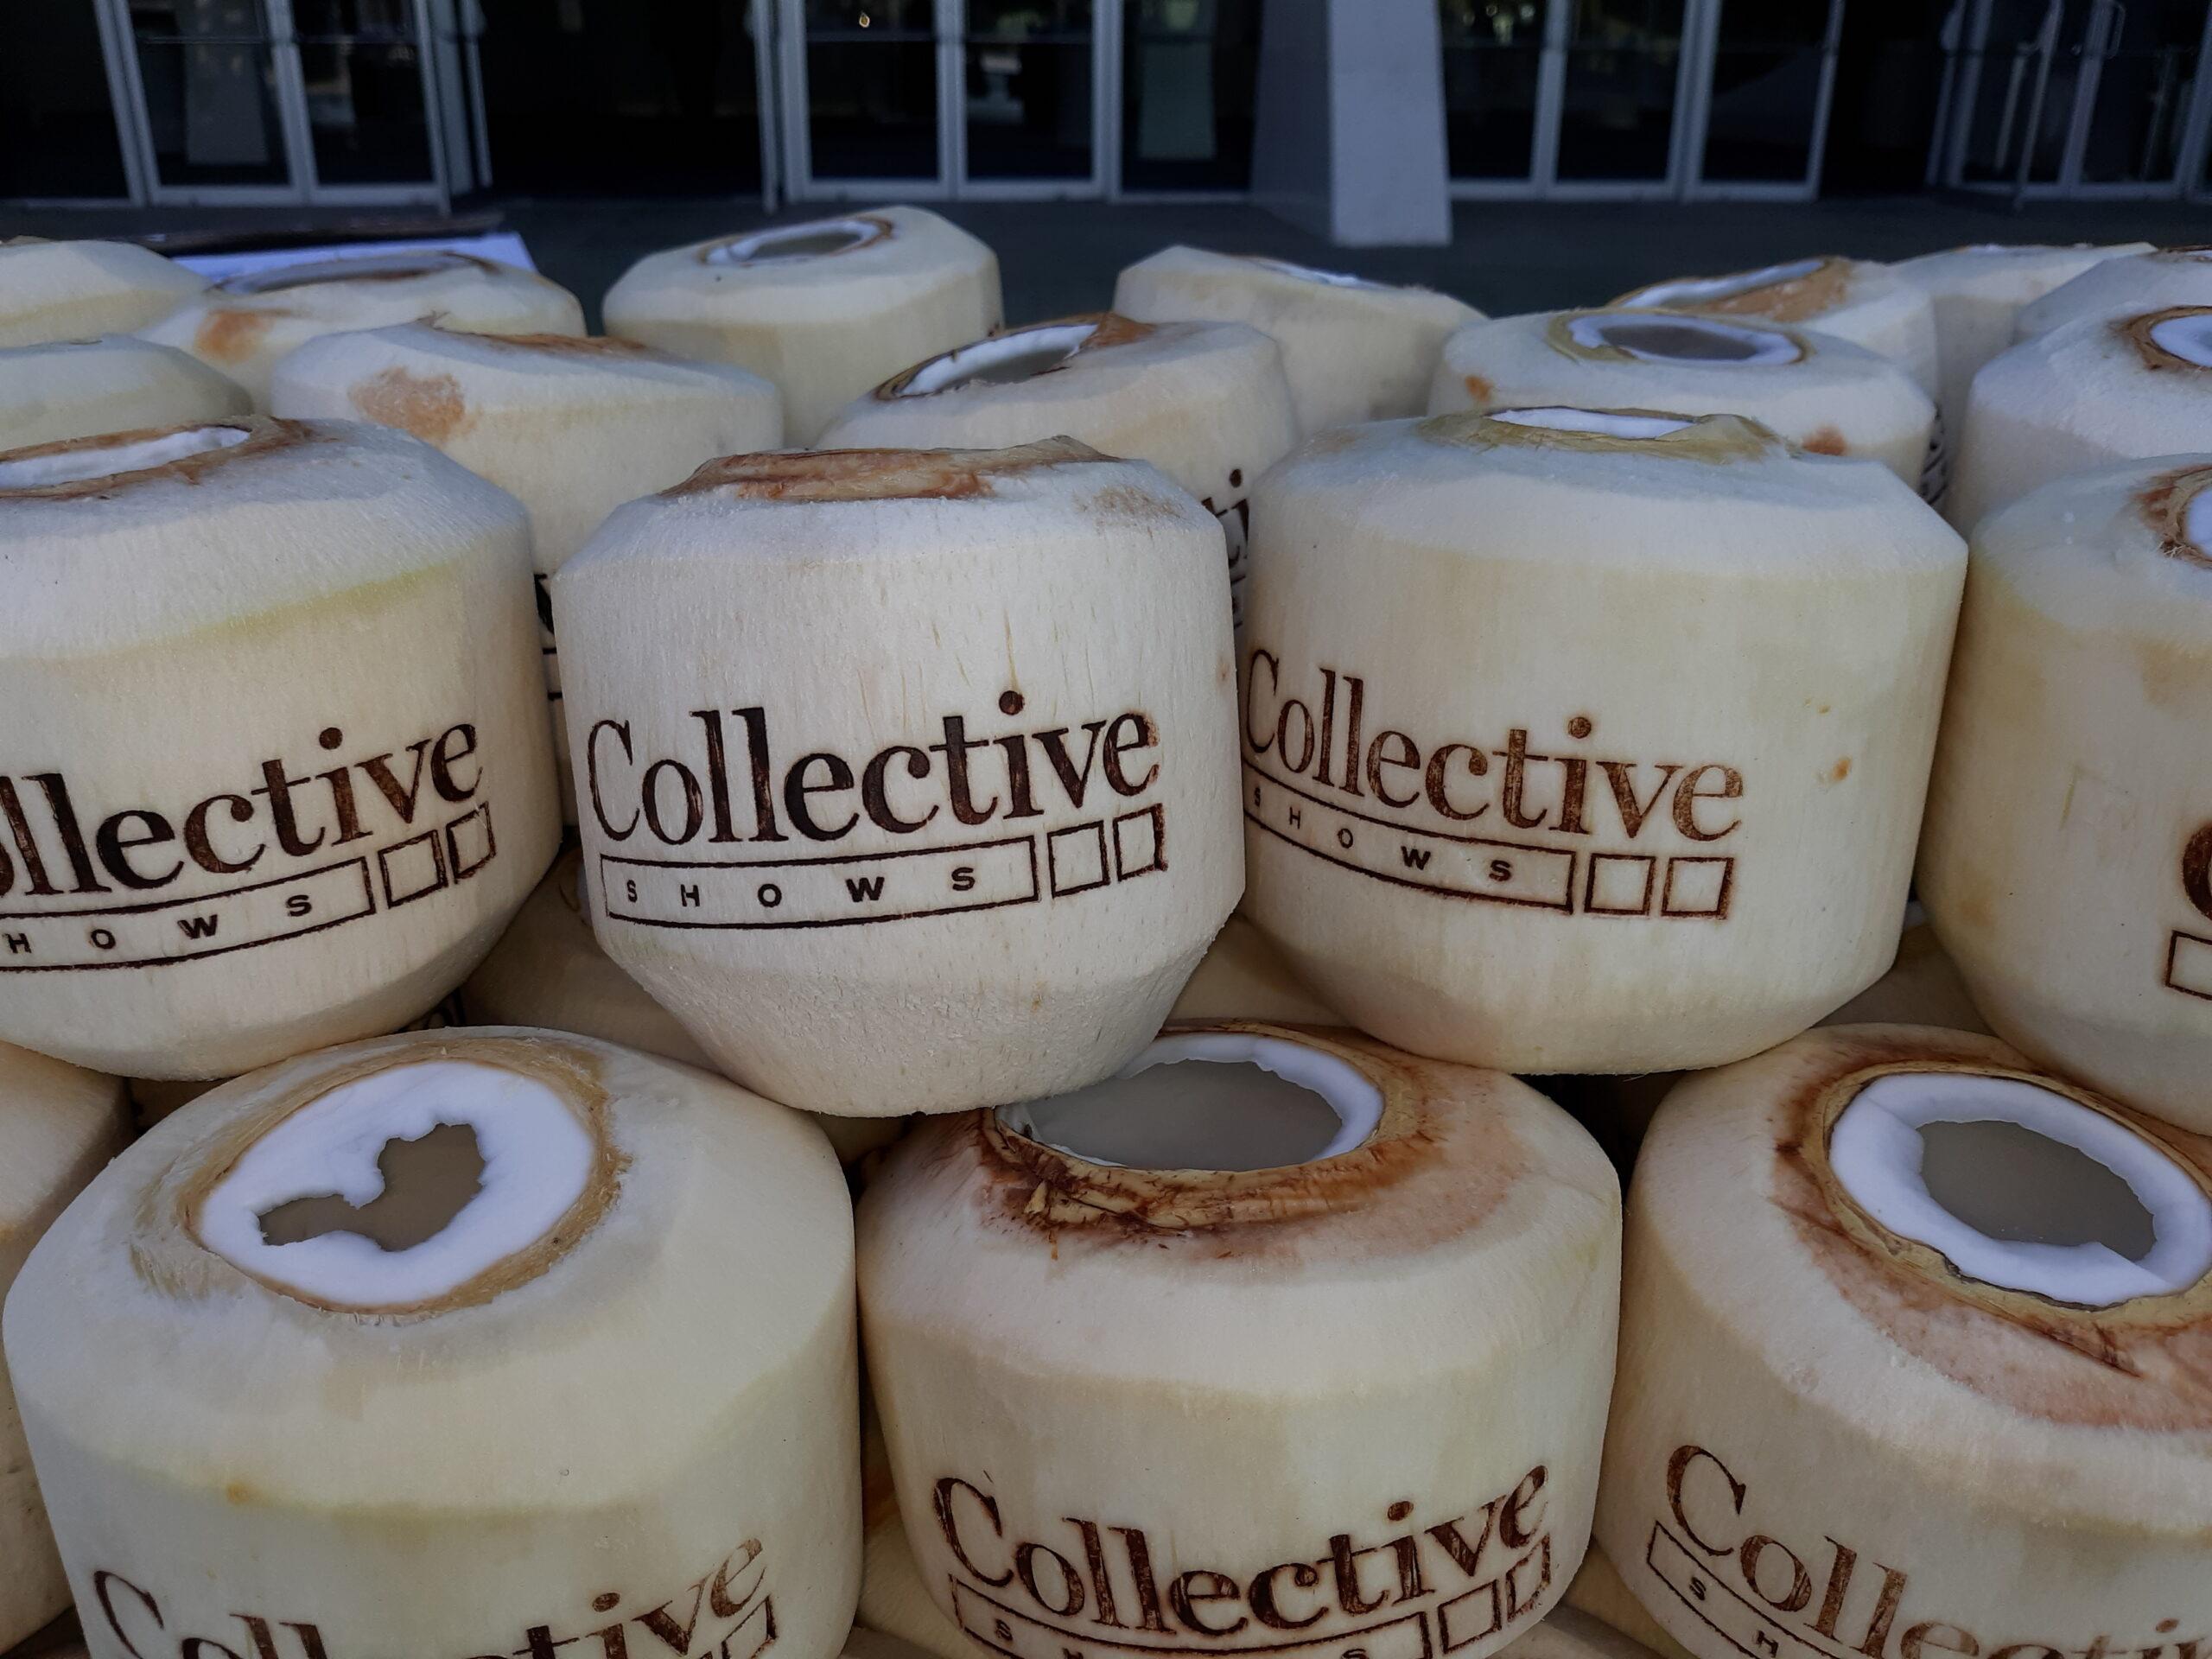 Custom Ink Branding Coconut for Corporate Event